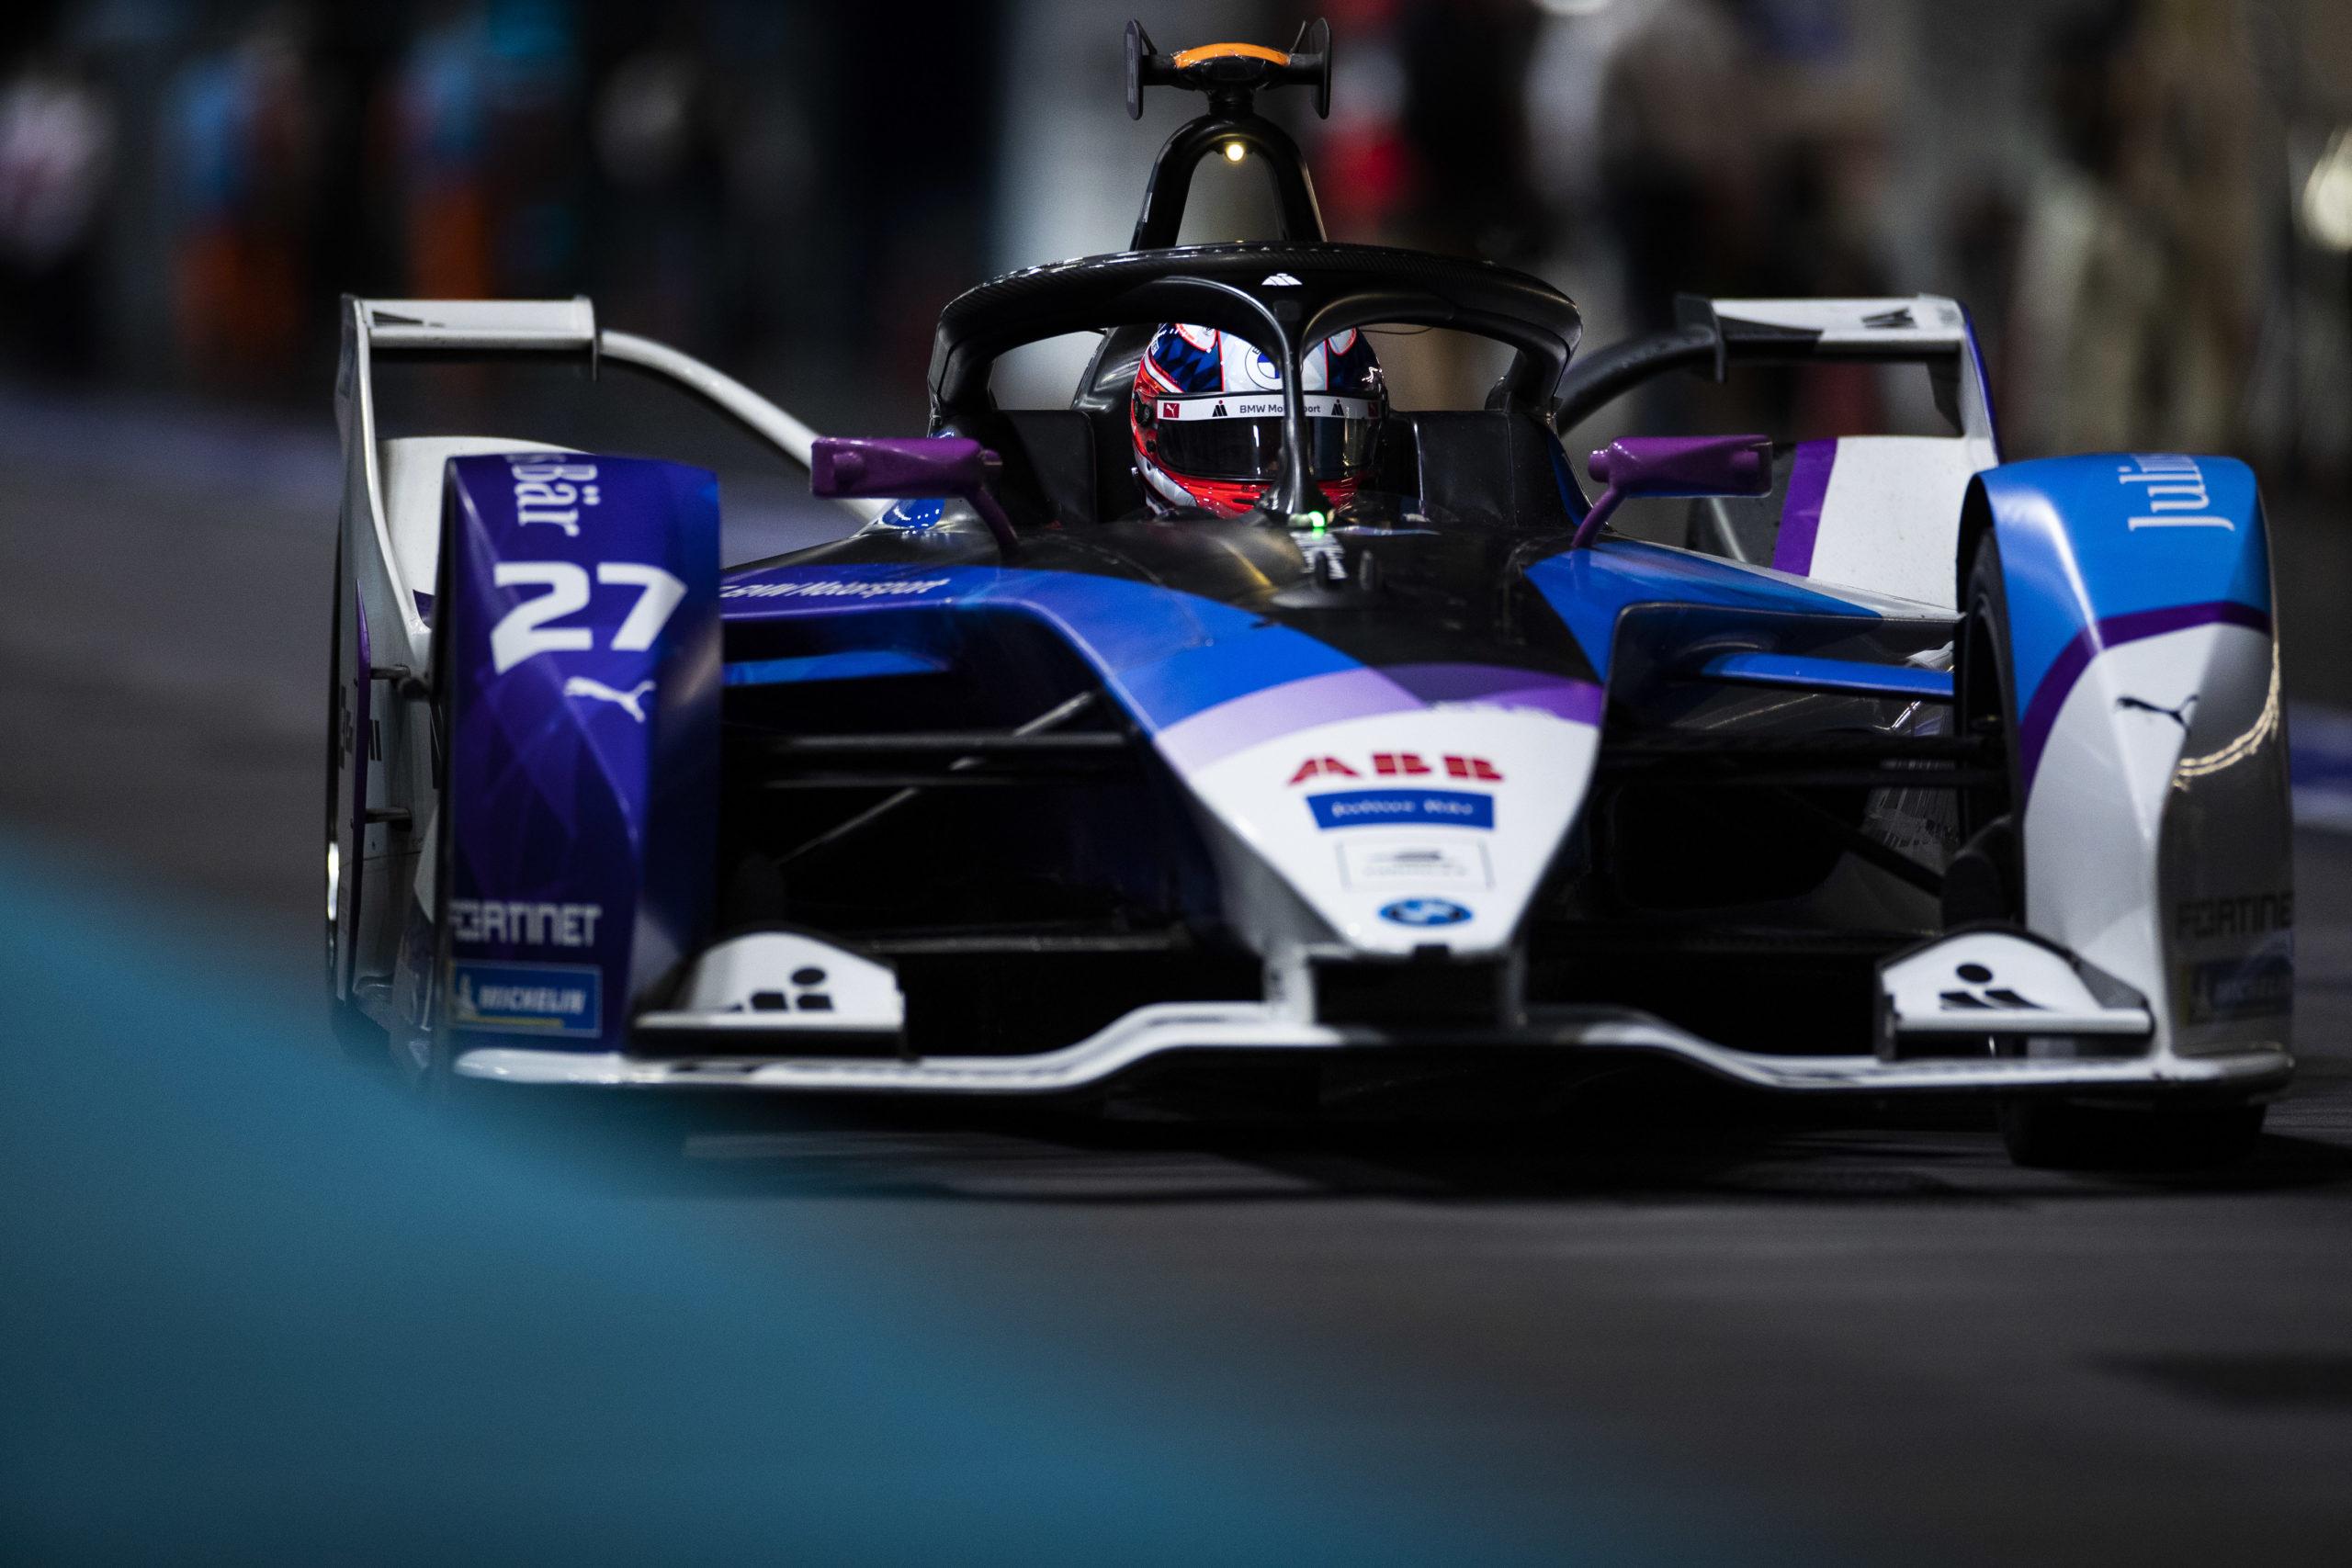 London (GBR), 23rd- 25th July 2021. ABB FIA Formula E World Championship, Season 7, London E-Prix, Jake Dennis (GBR) #27 BMW iFE.21, BMW i Andretti Motorsport.